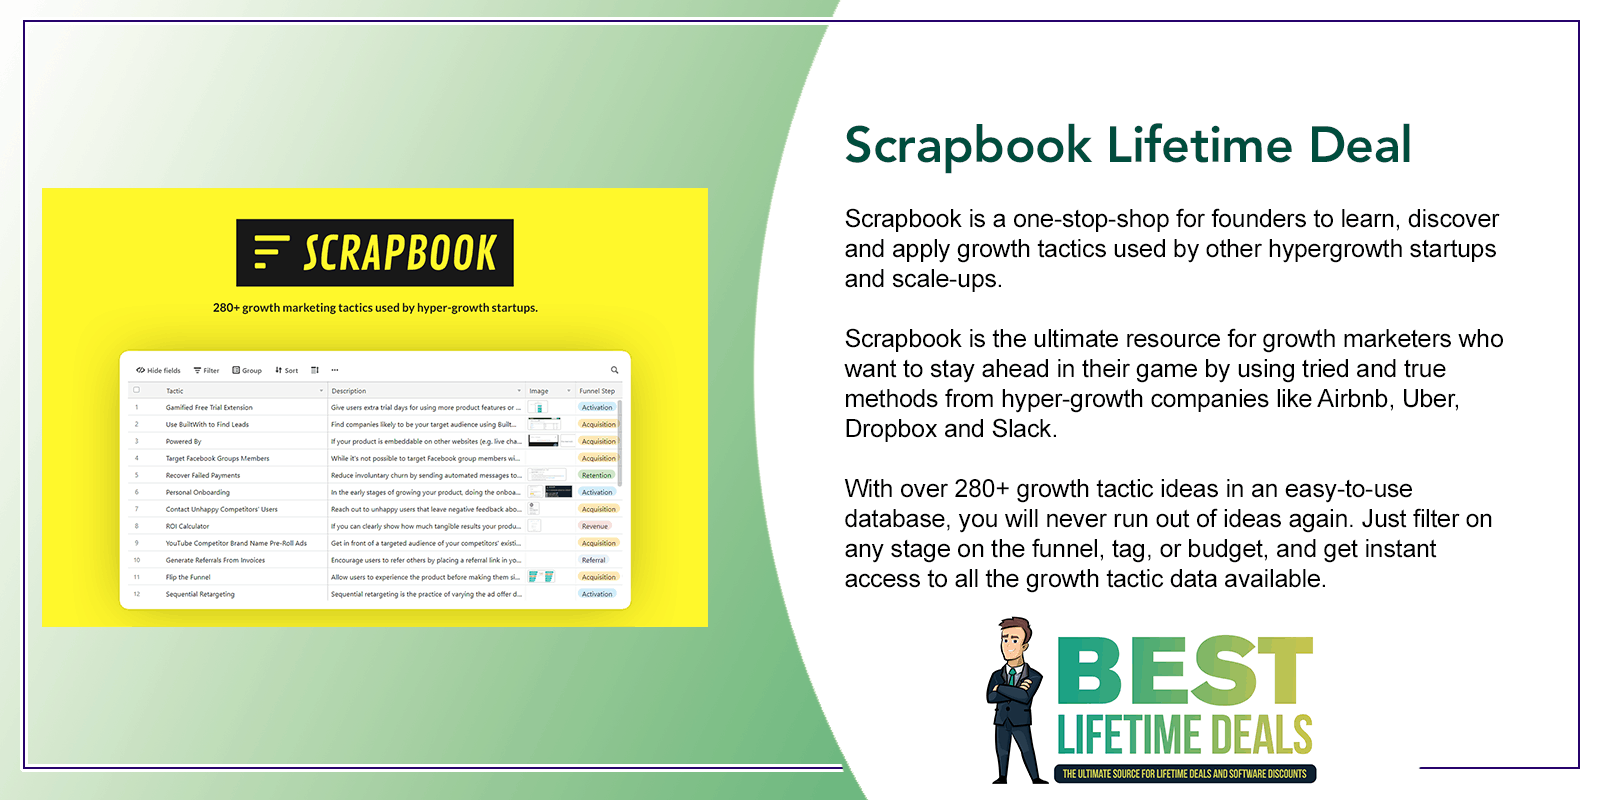 Scrapbook Lifetime Deal Post Image